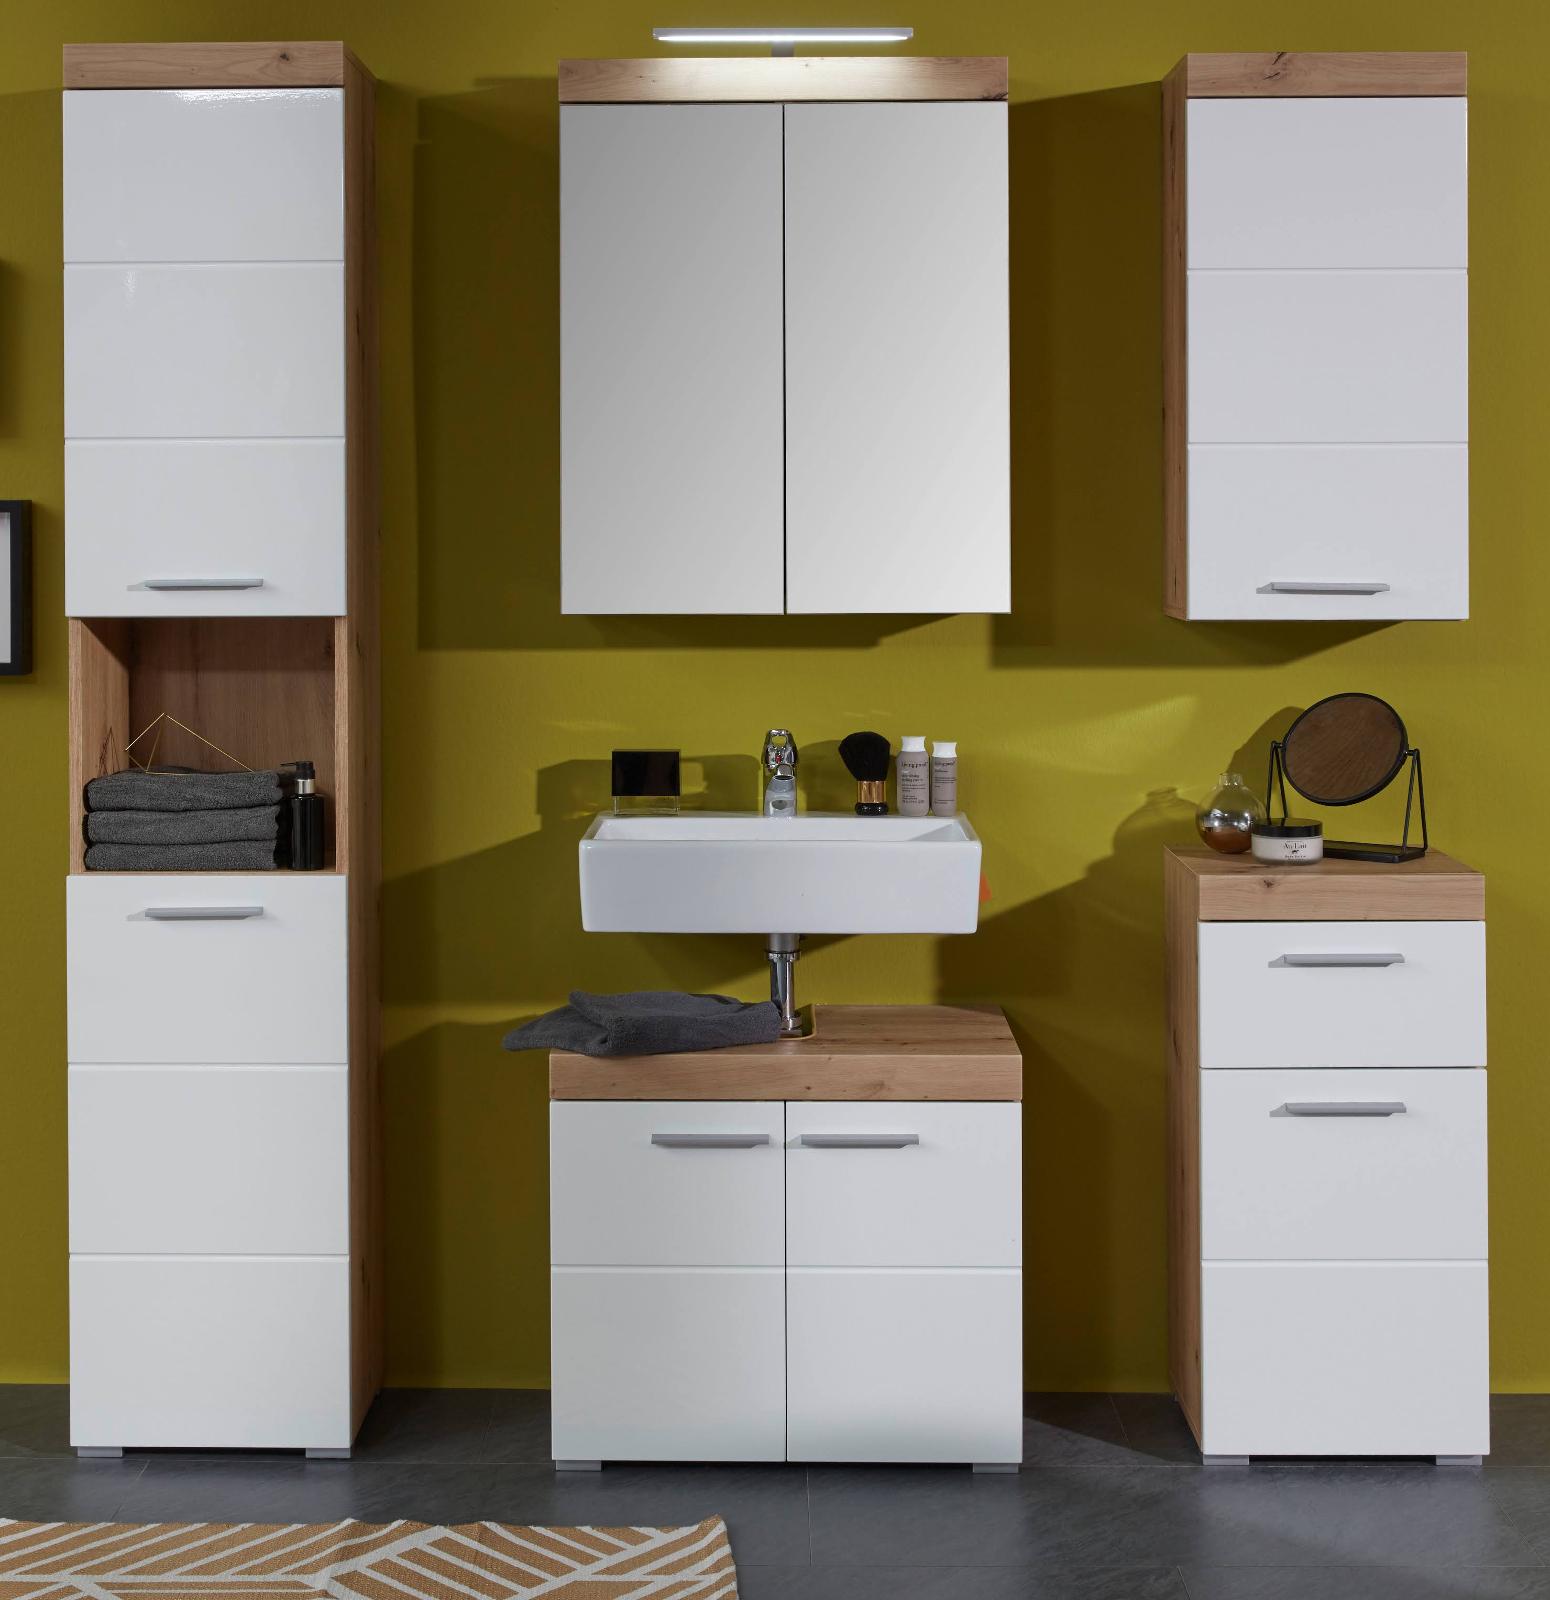 Etagenbett Grau : Kinderbett doppelstockbett etagenbett u einzigartige kaufexpert